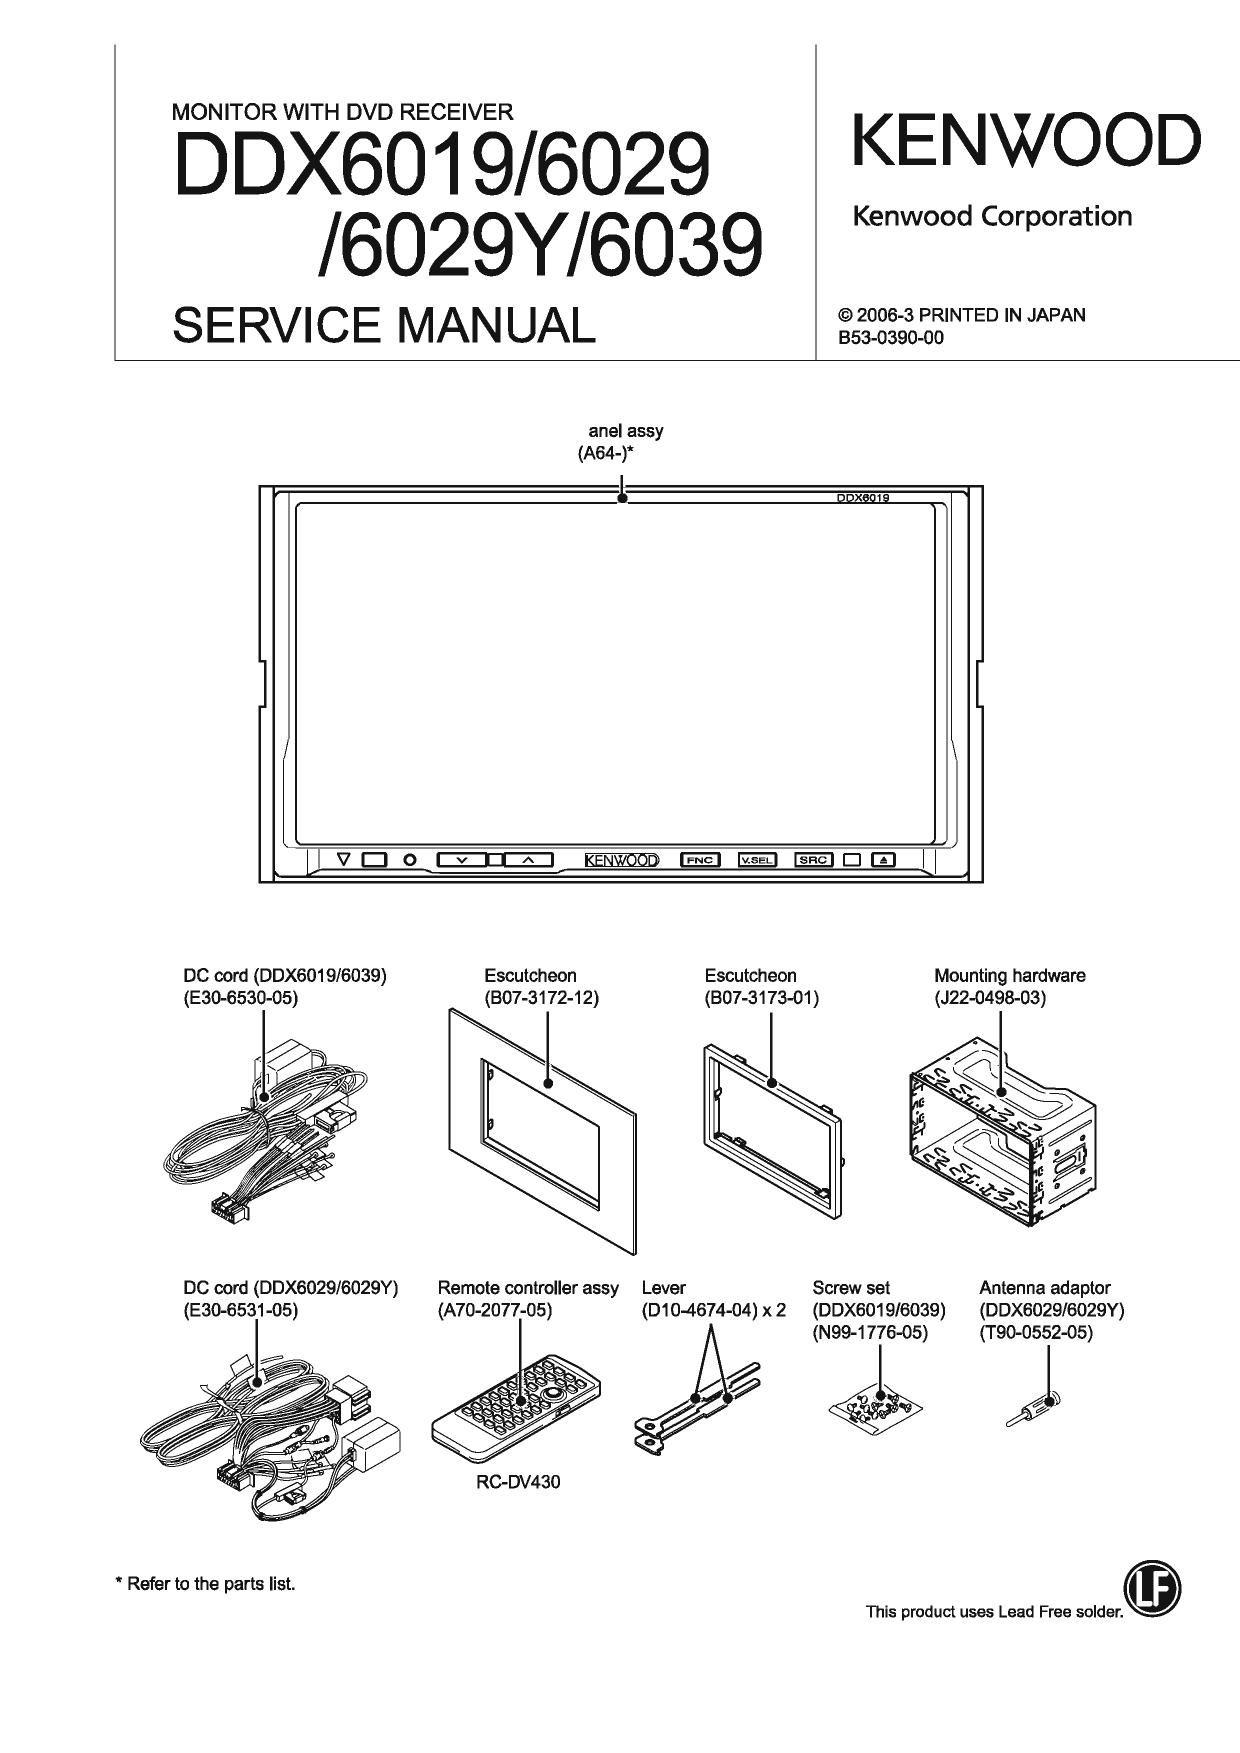 kenwood ddx 6019 hu service manual rh audioservicemanuals com Kenwood DDX 470 Backup Camera Kenwood DDX 470